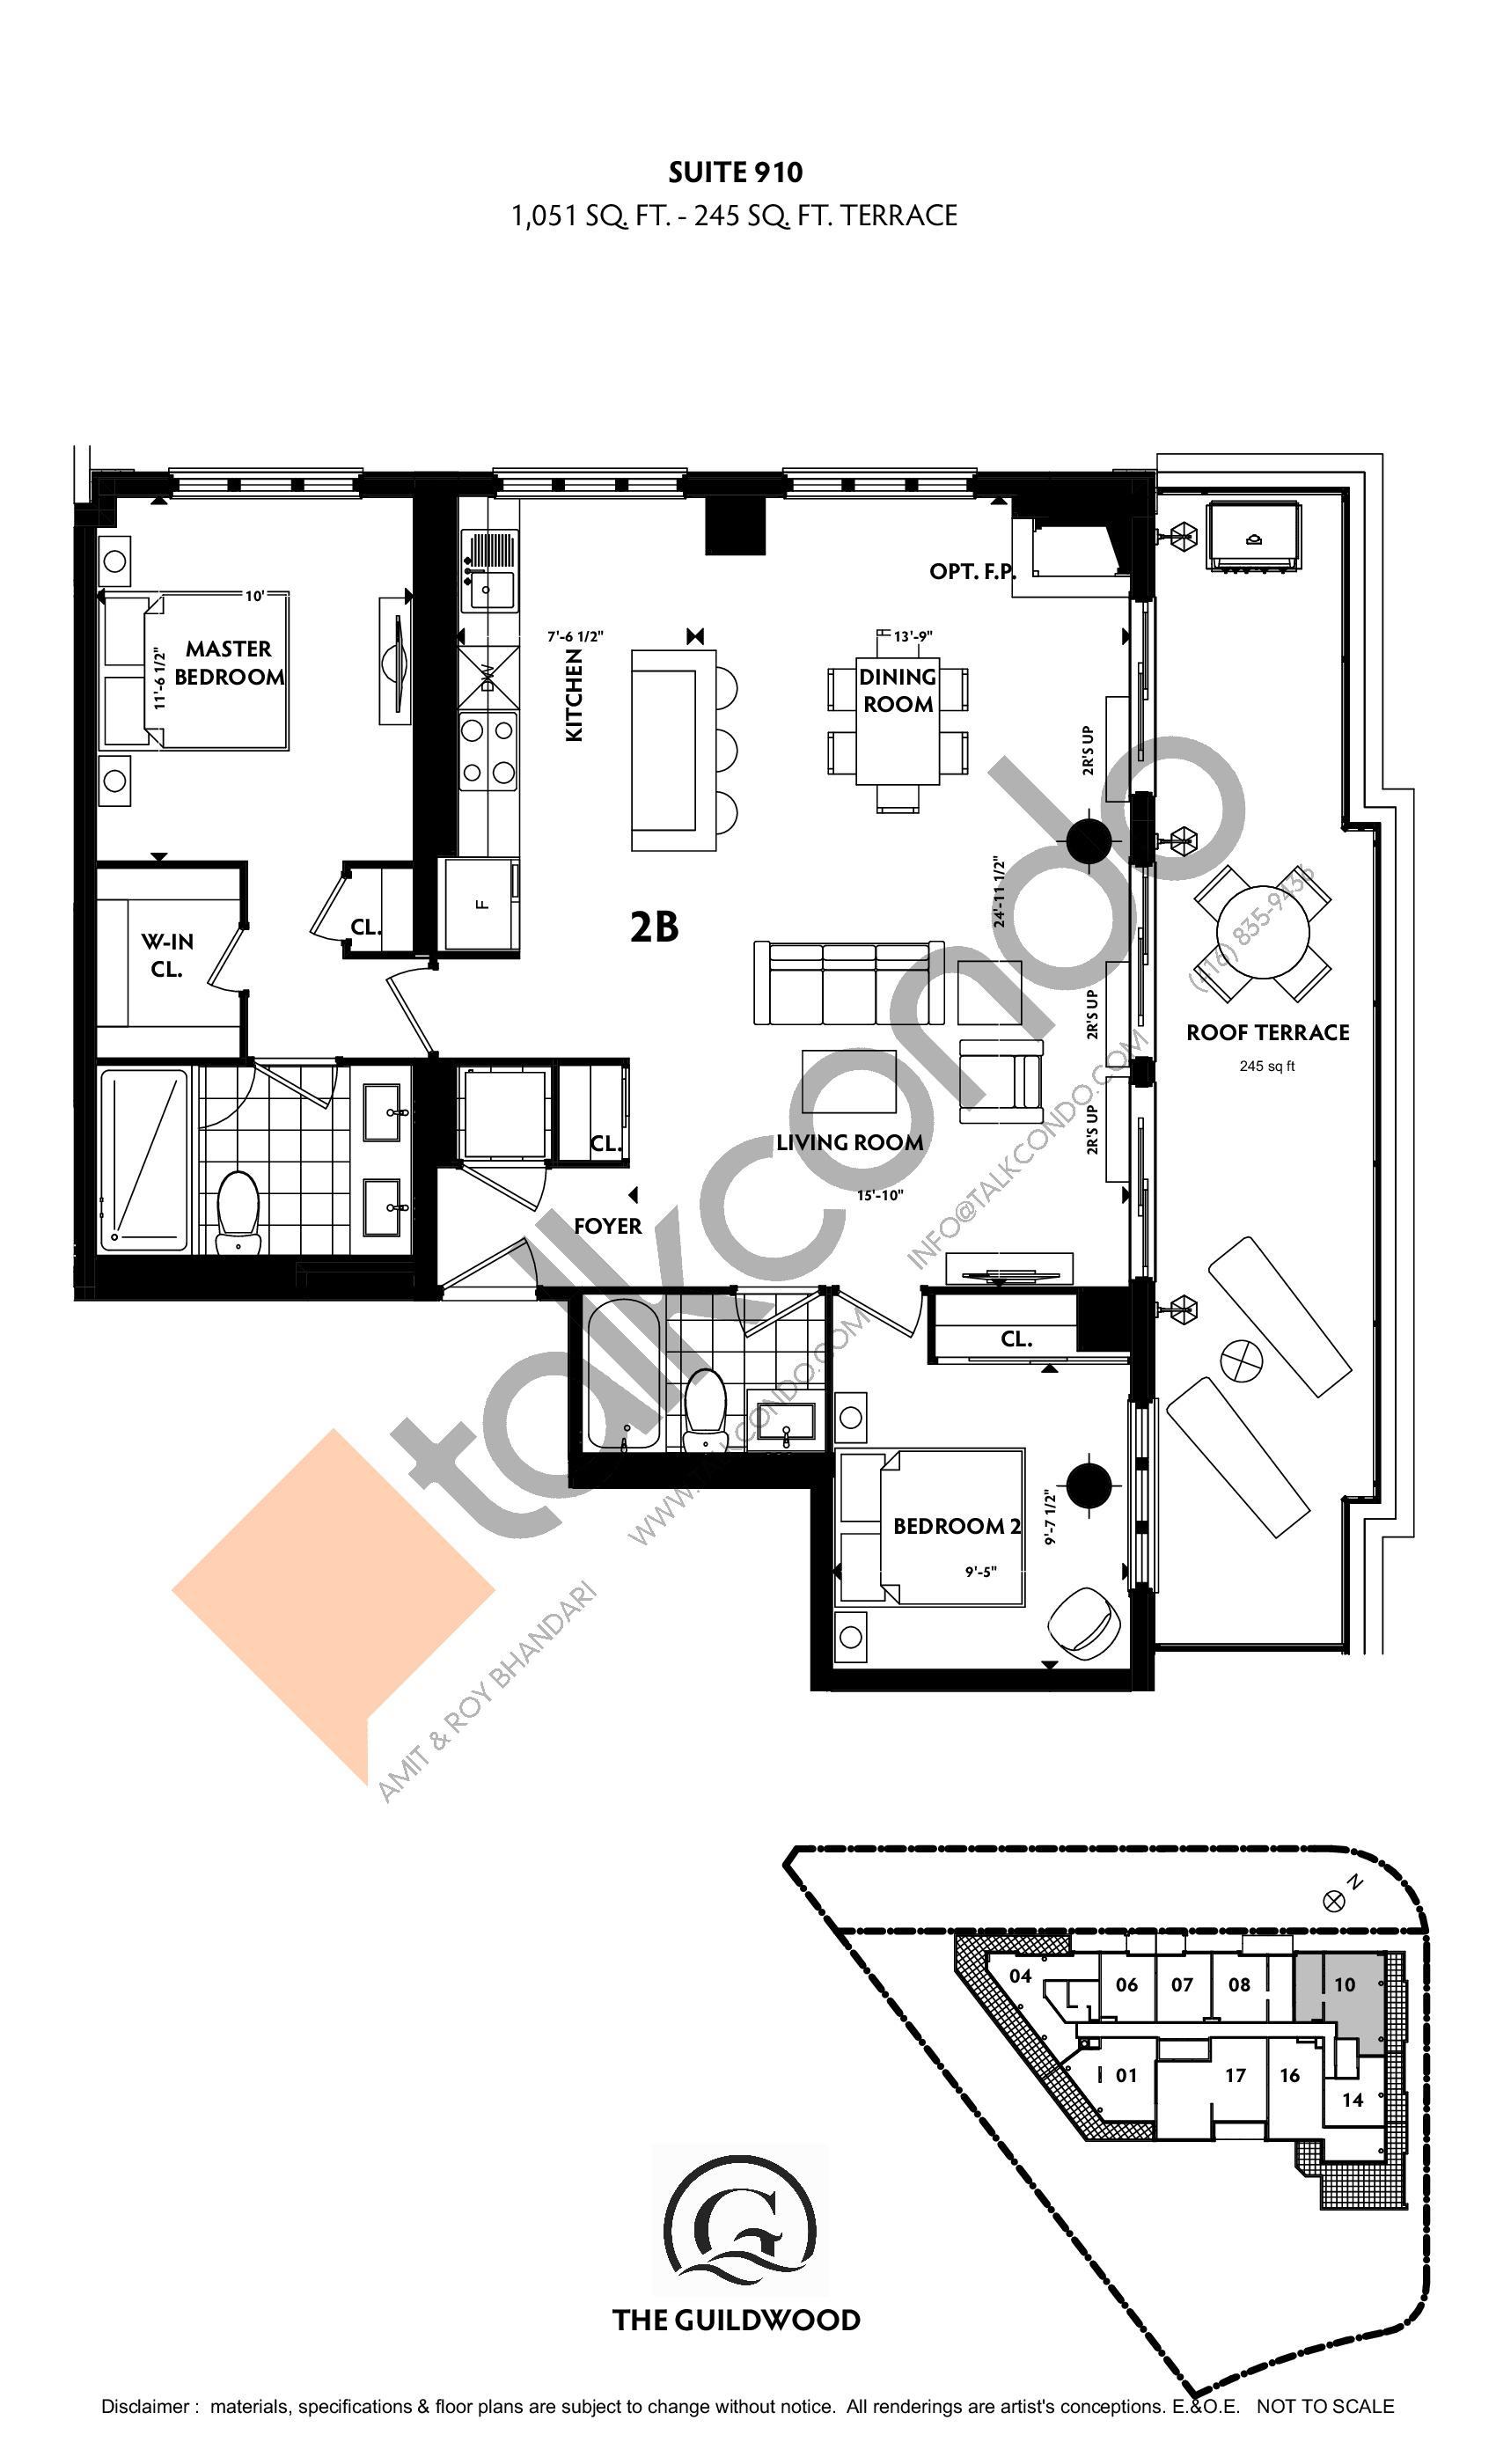 Suite 910 Floor Plan at Guildwood Condos - 1051 sq.ft